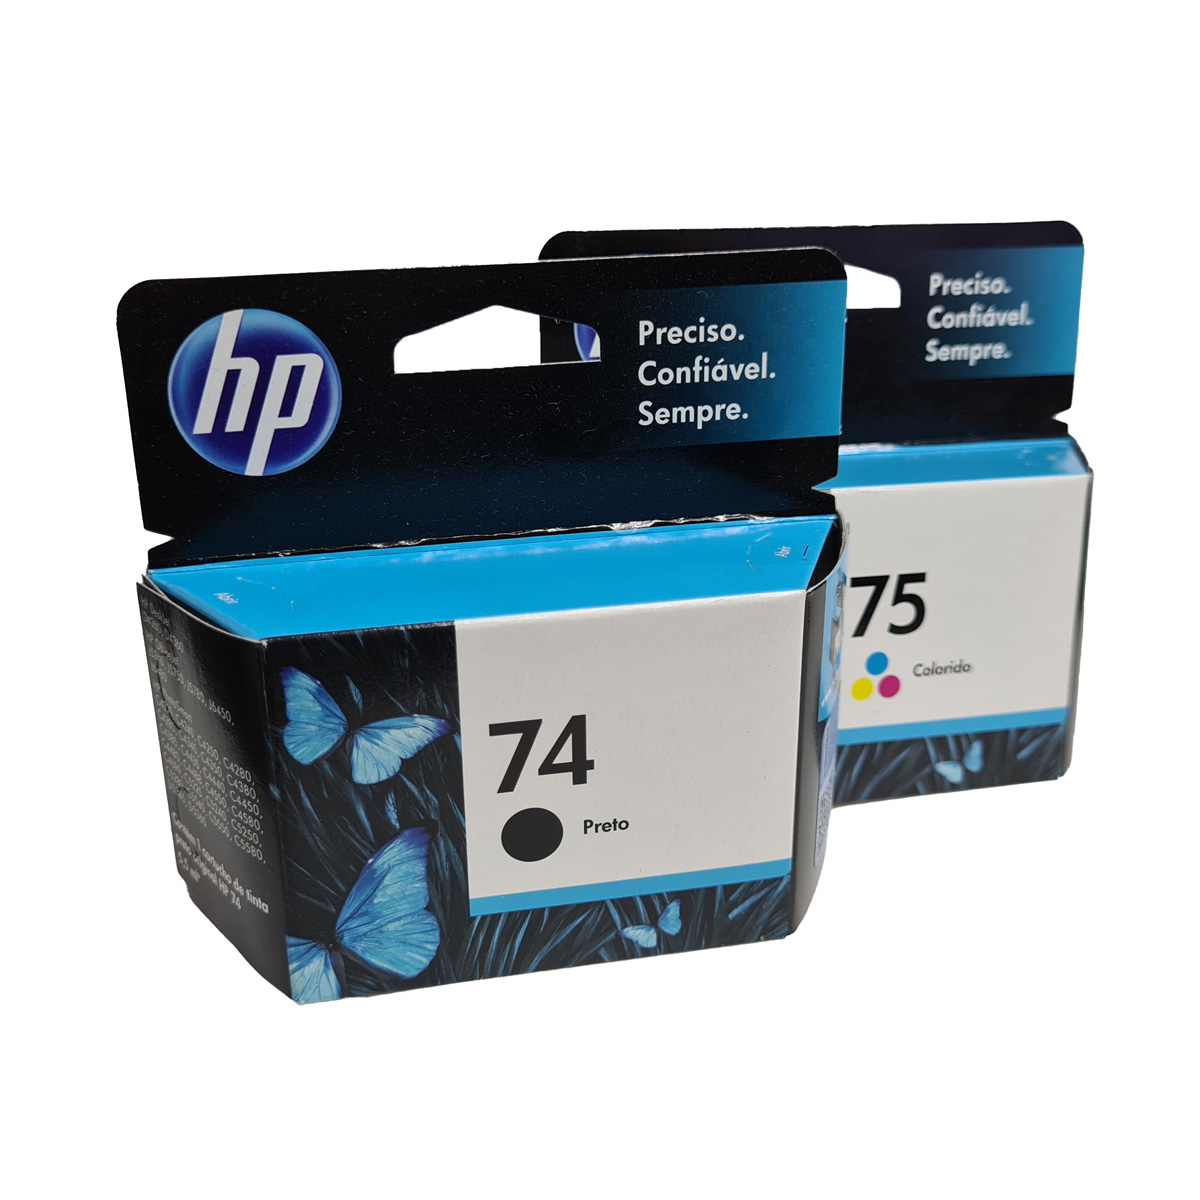 Kit Cartucho HP 74 75 CB335WL Preto e Colorido para D4260 C4280 D4360